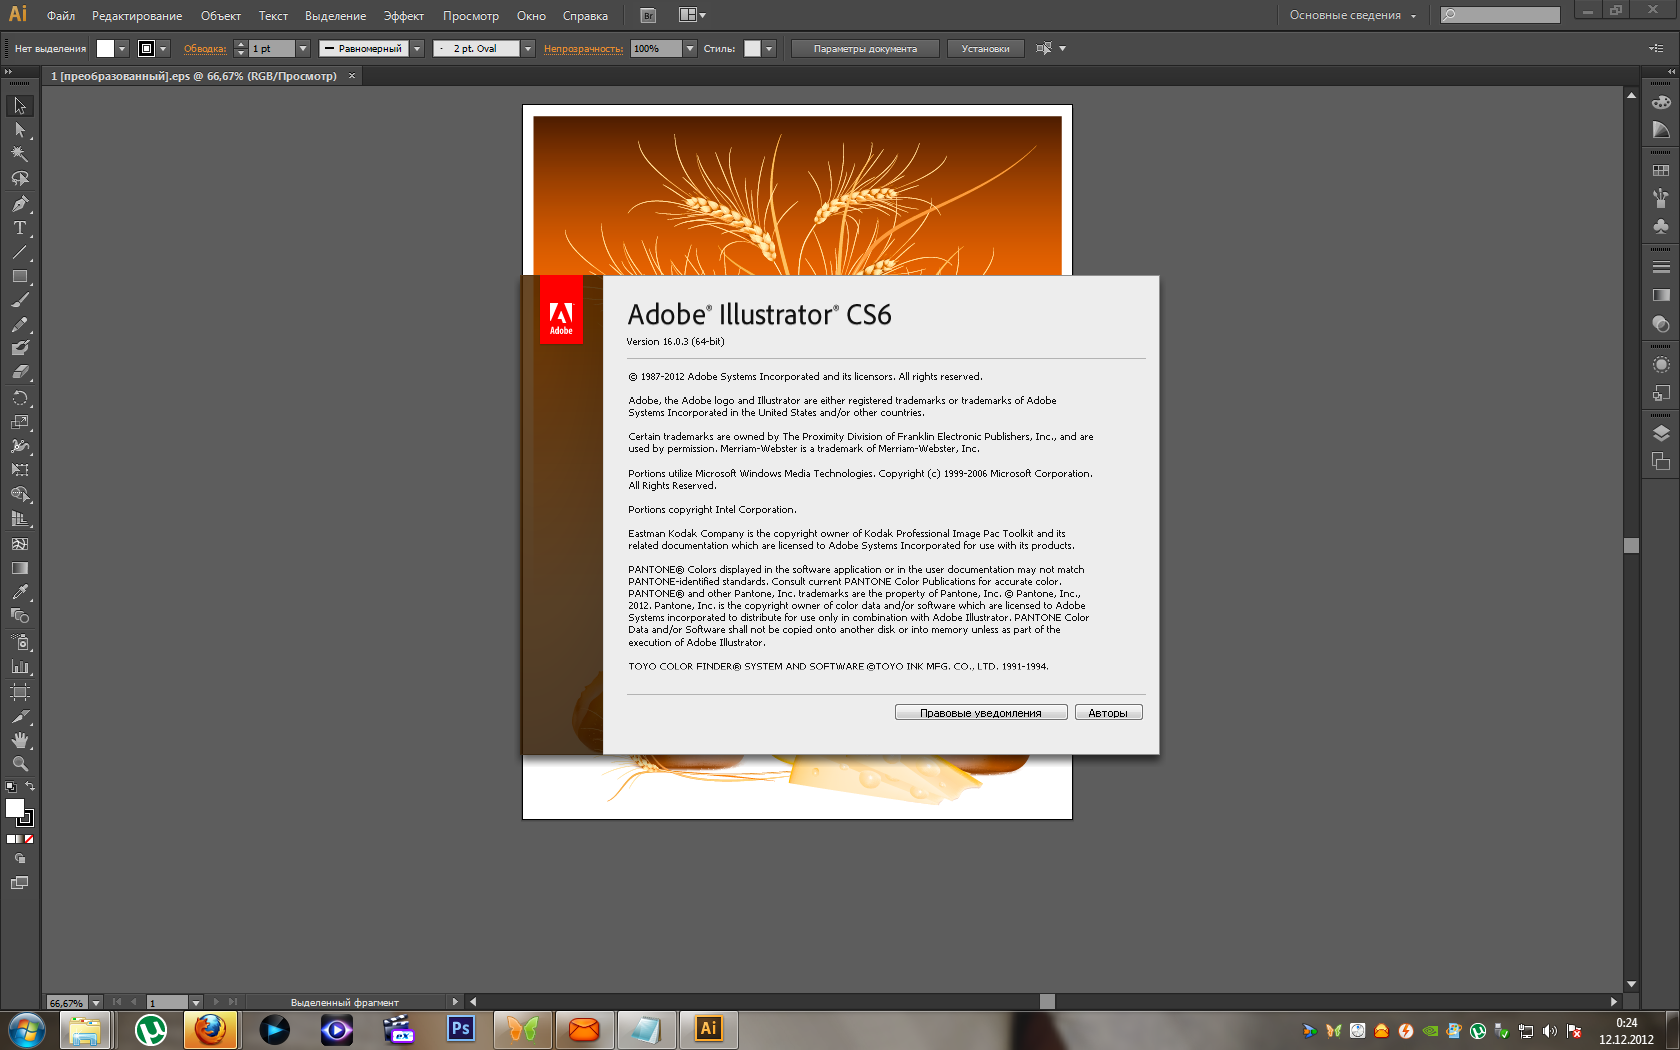 Adobe Illustrator CS6 v.16.0.3 ML/Rus